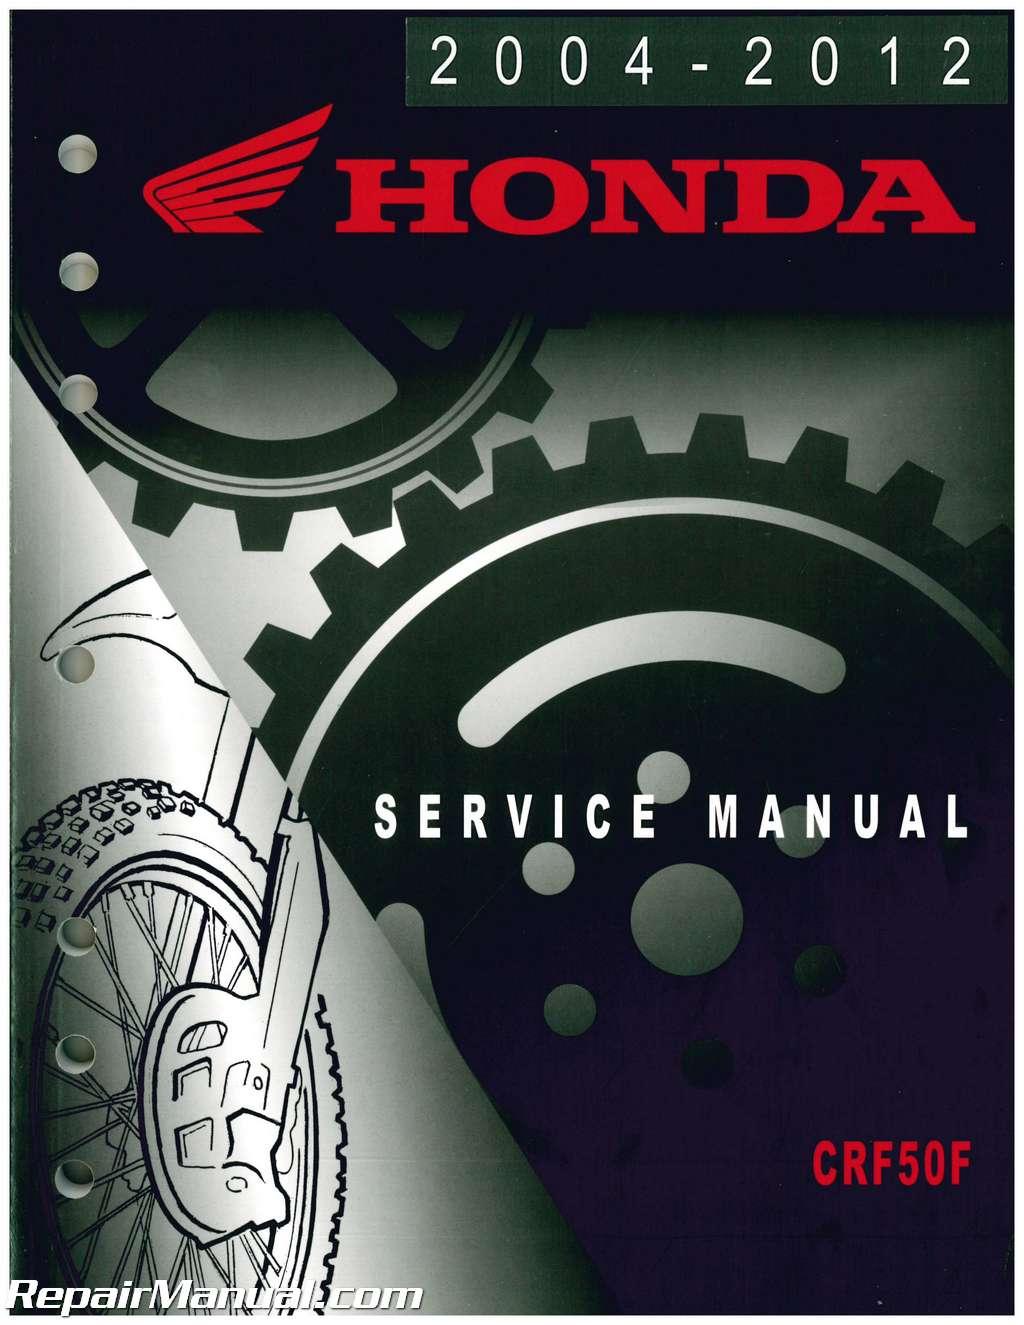 2004 crf50 service manual pdf